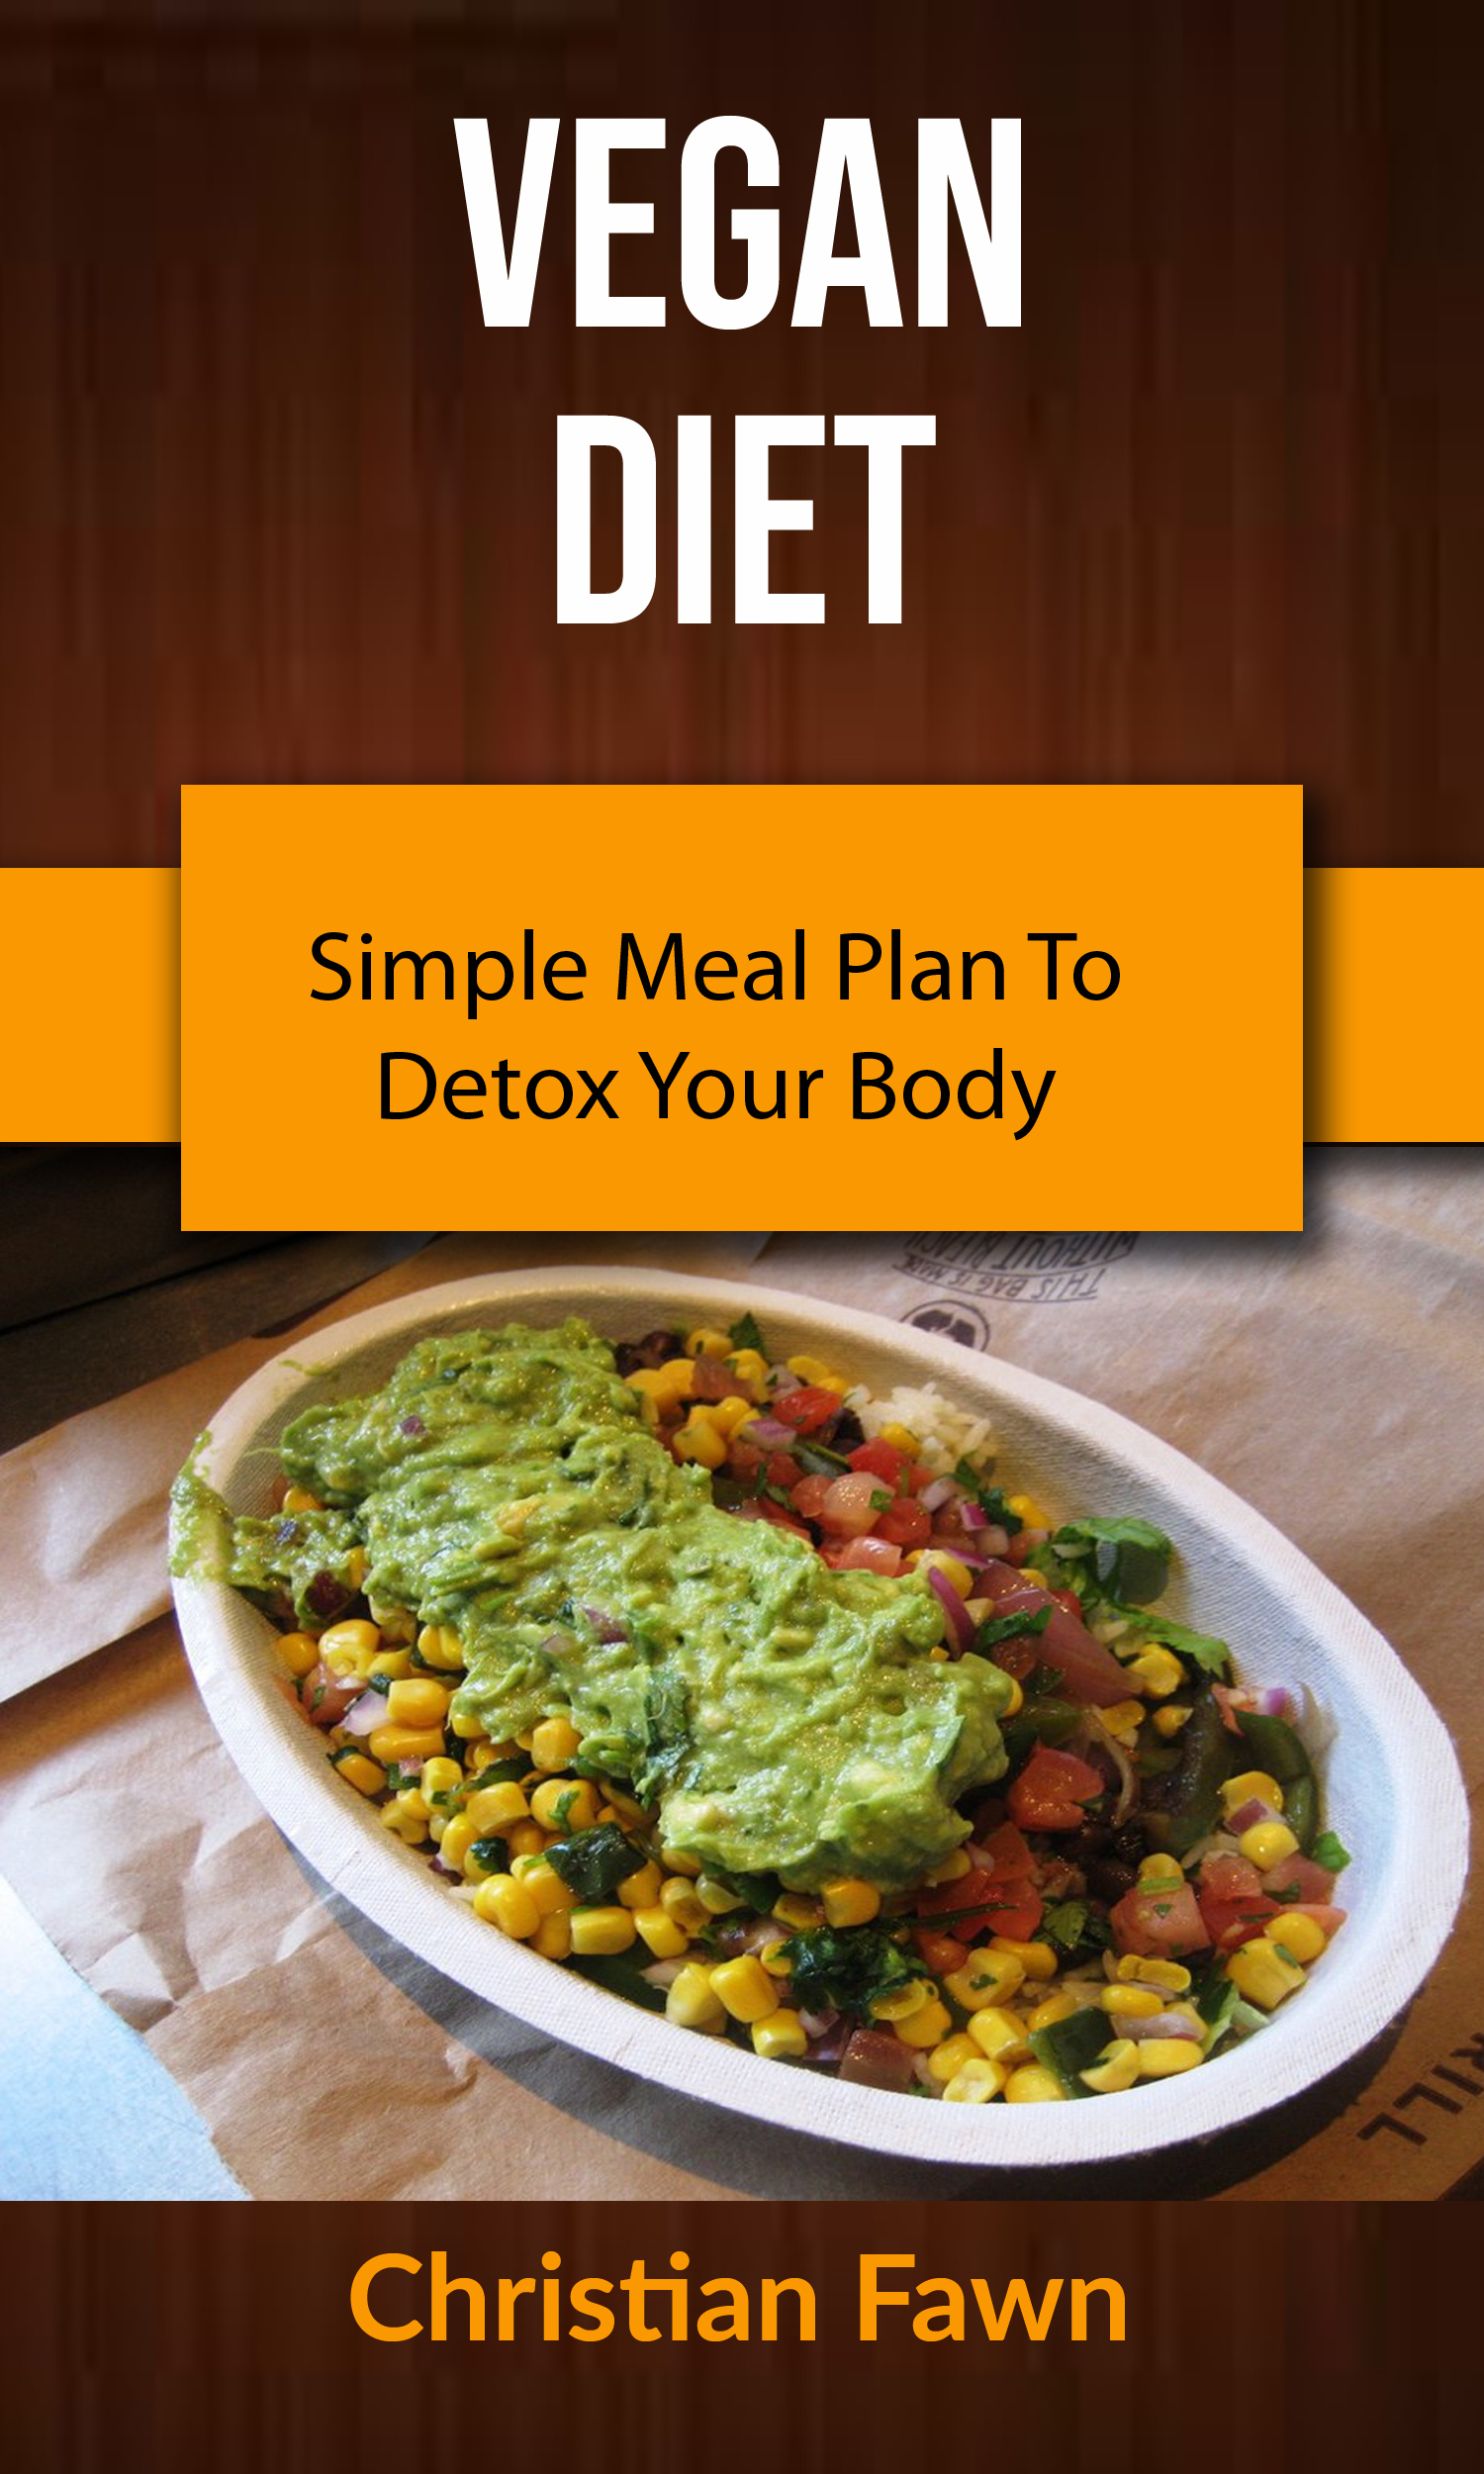 Vegan diet: simple meal plan to detox your body